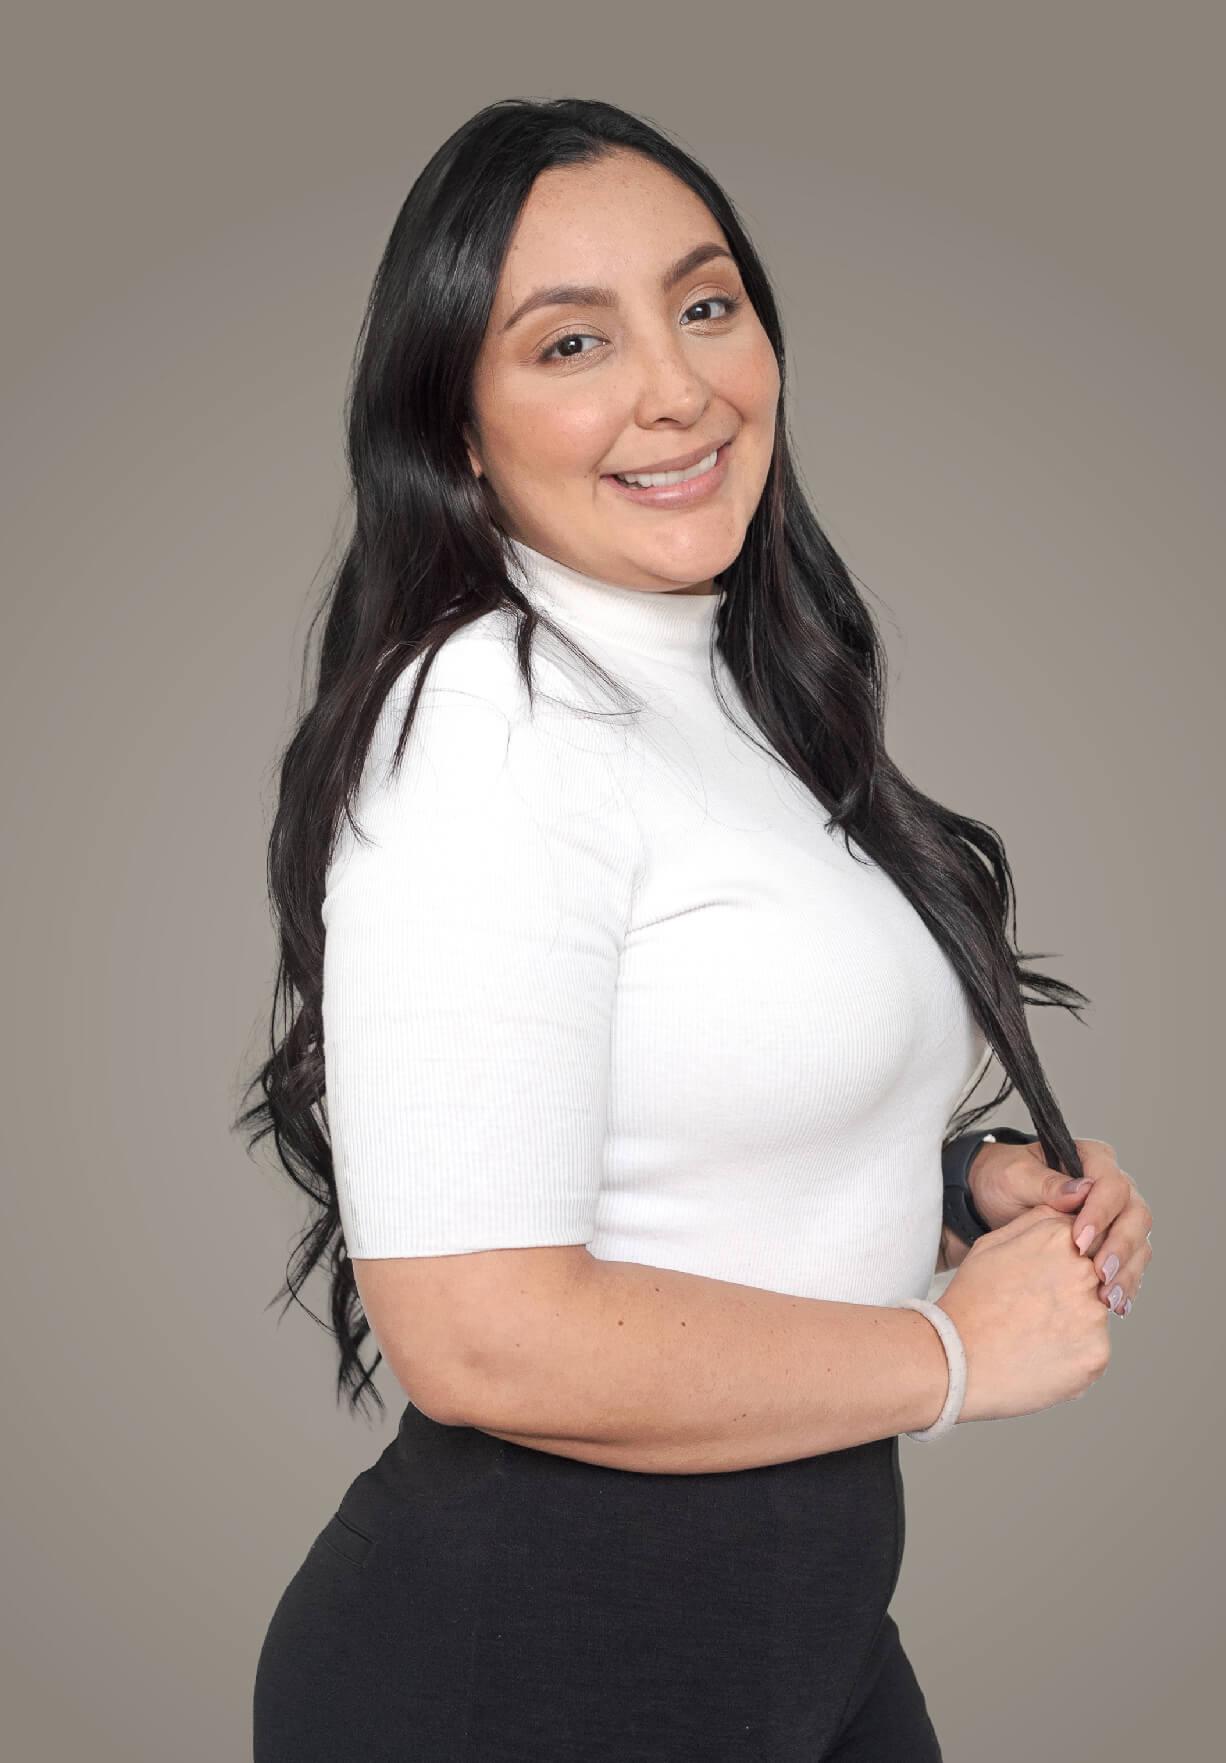 Laura Ordoñez